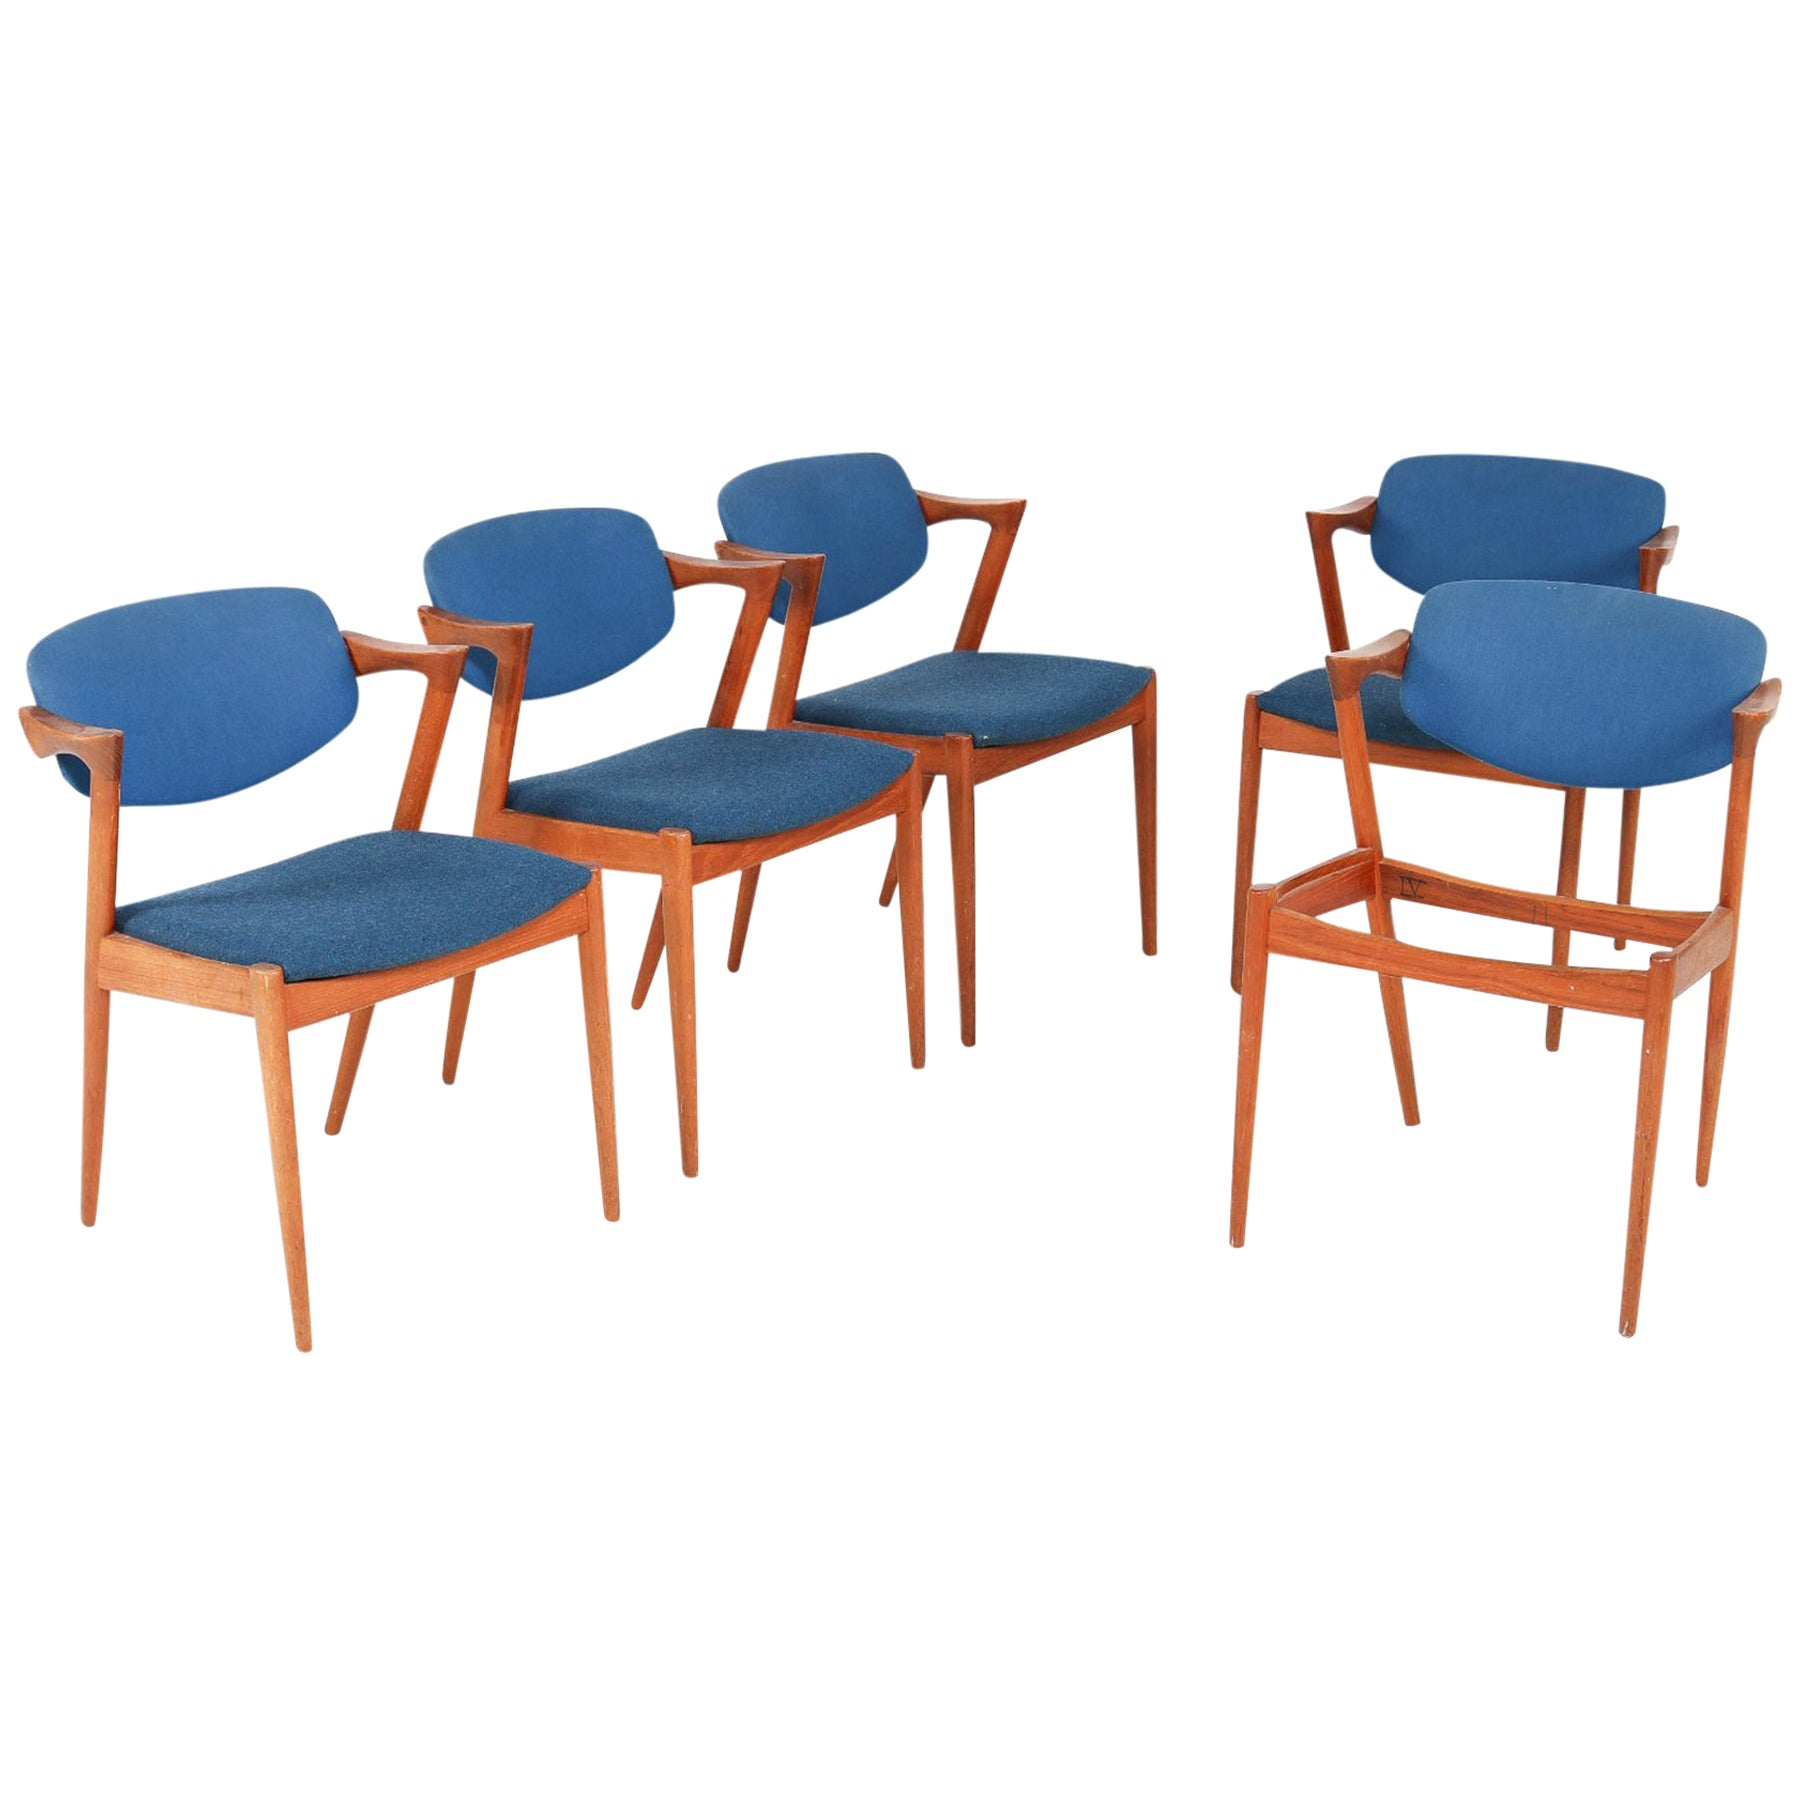 Set of Five Kai Kristiansen Model 42 Danish Modern Dining Chairs in Teak